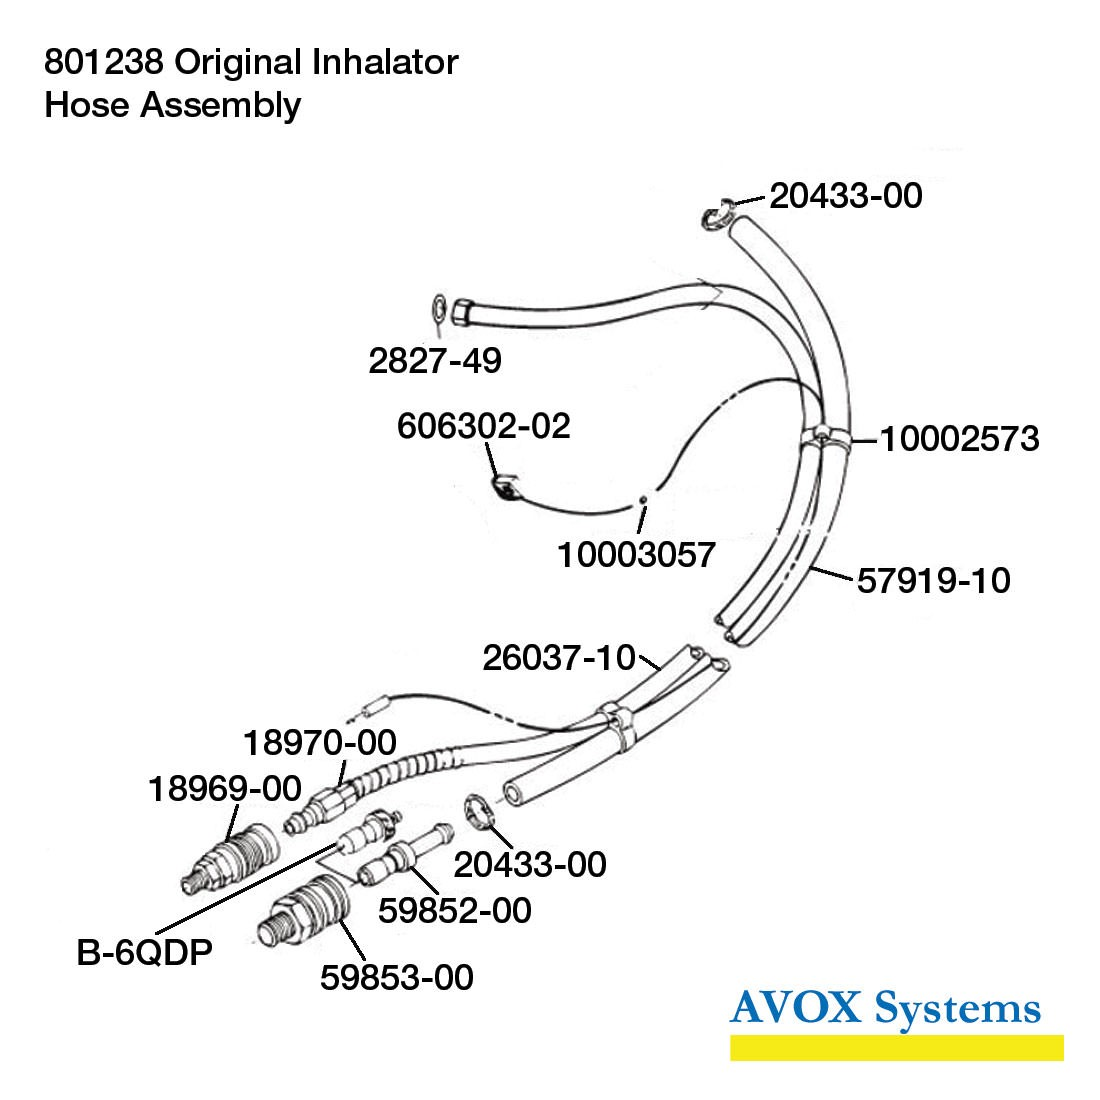 Avox 801238-01 Original Inhalator without 1st Stage Regulator Assembly without Microphone Assembly - Hose Assembly